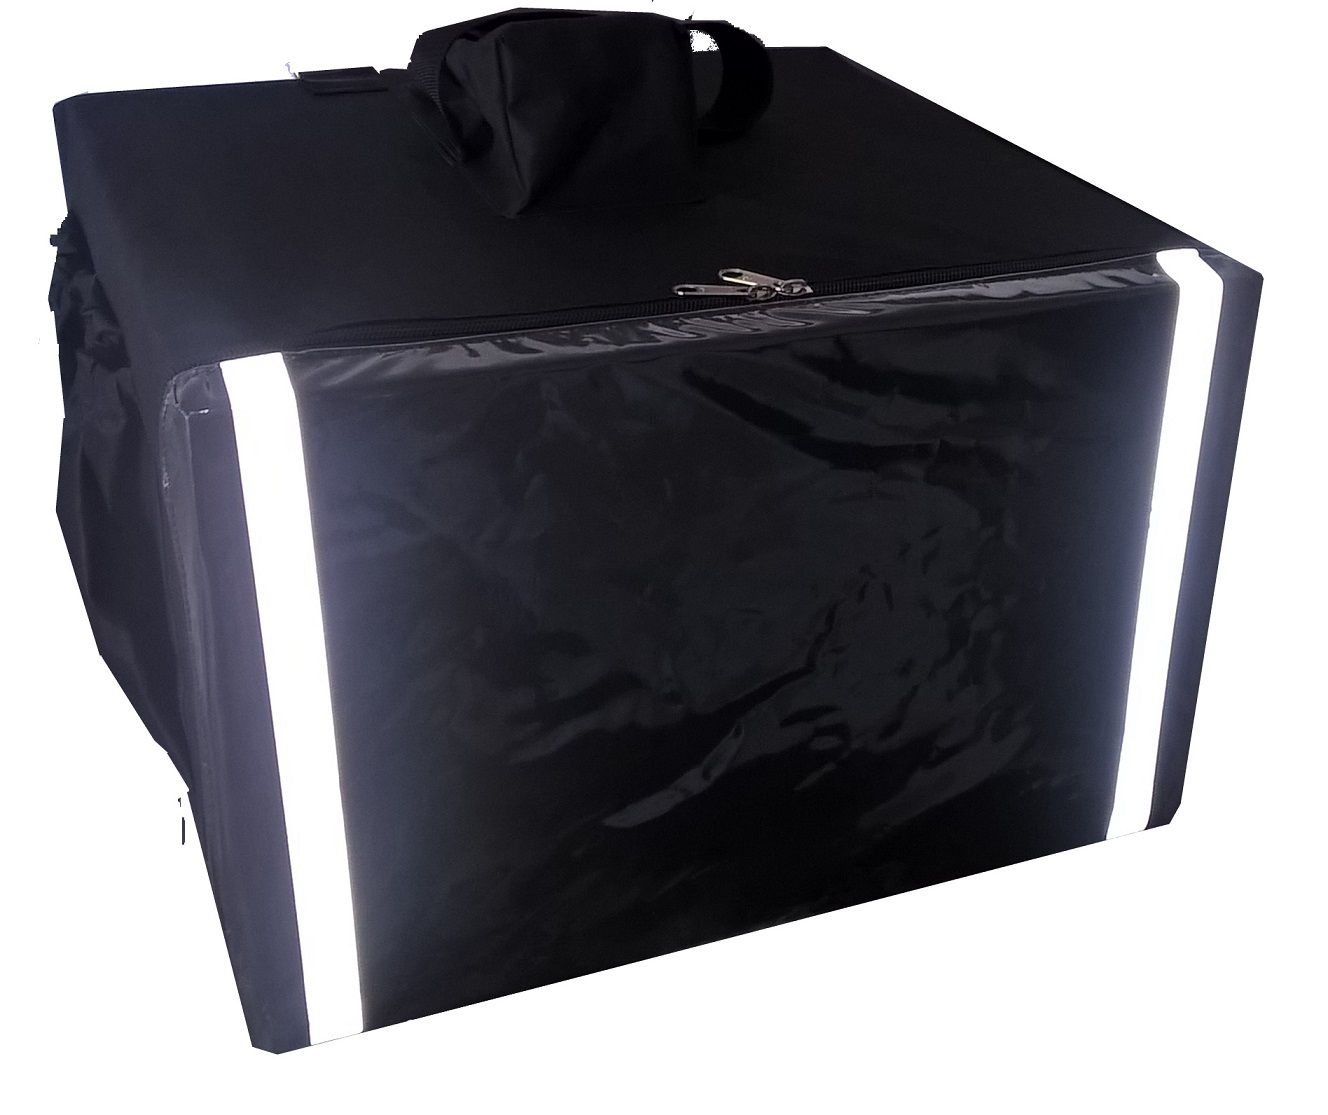 Bolsa Mochila Para Entrega De 12 Marmitex Isopor Redonda N°8/9 Iso12  - GuerreiroOnline Bolsas e Mochilas para Pizza Lanches Marmitex